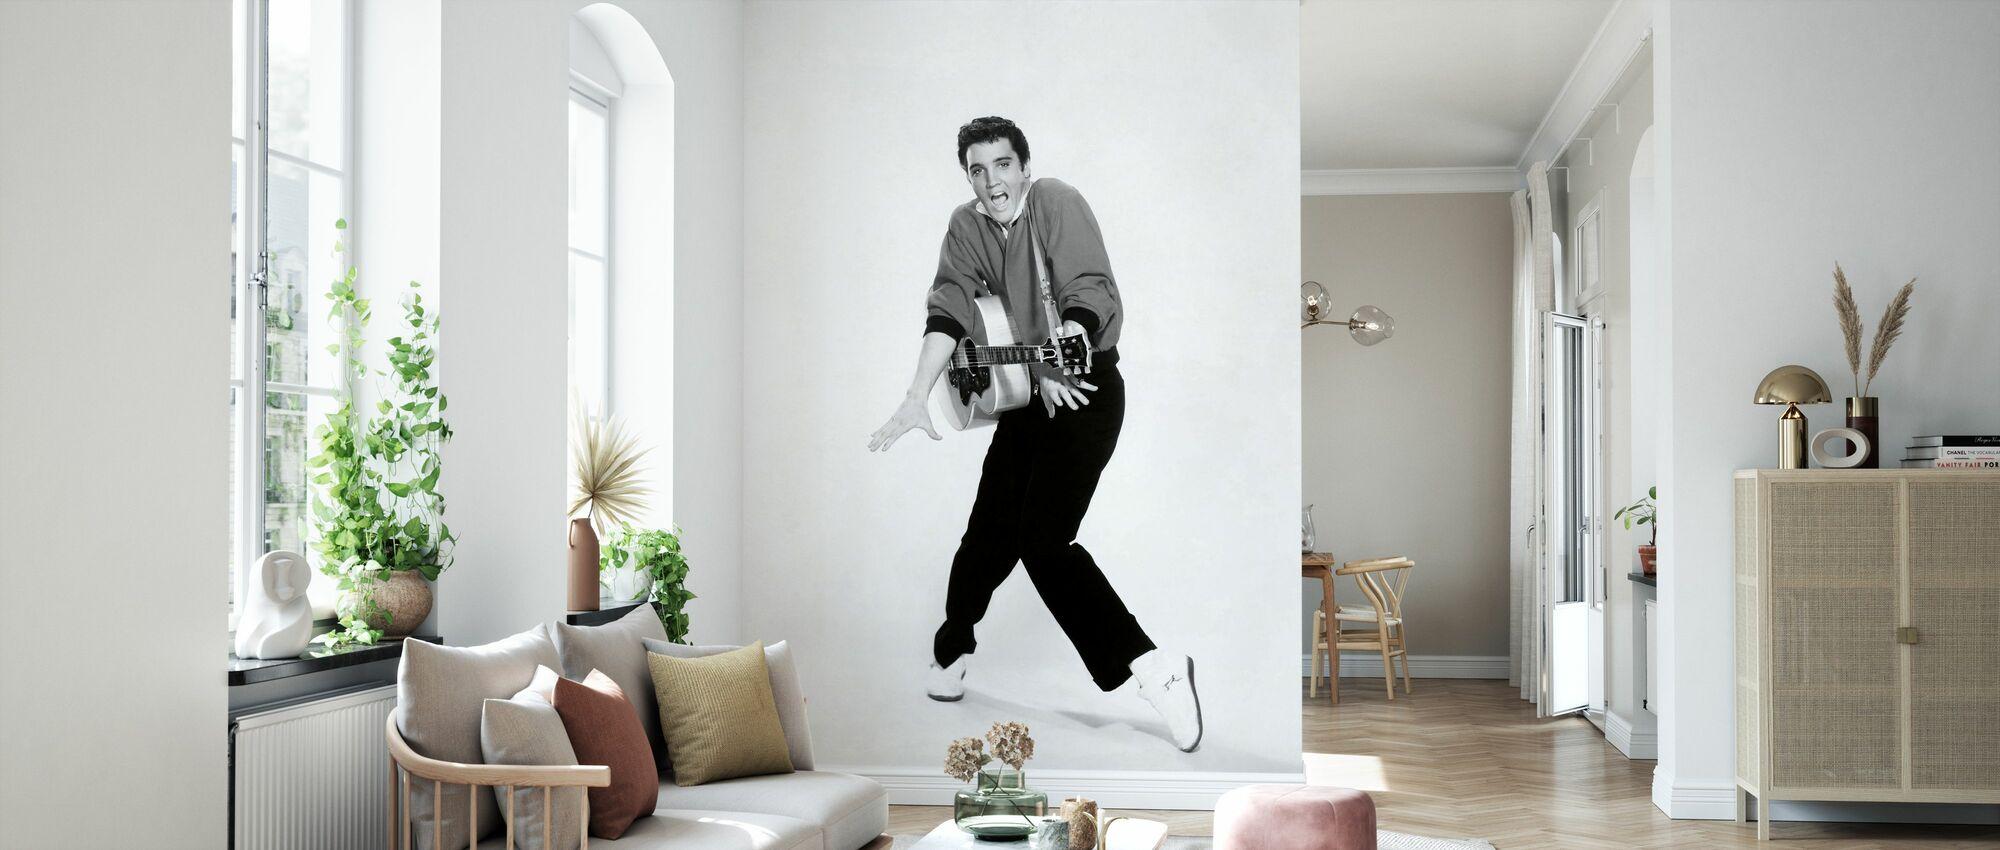 Jailhouse Rock - Elvis Presley - Wallpaper - Living Room